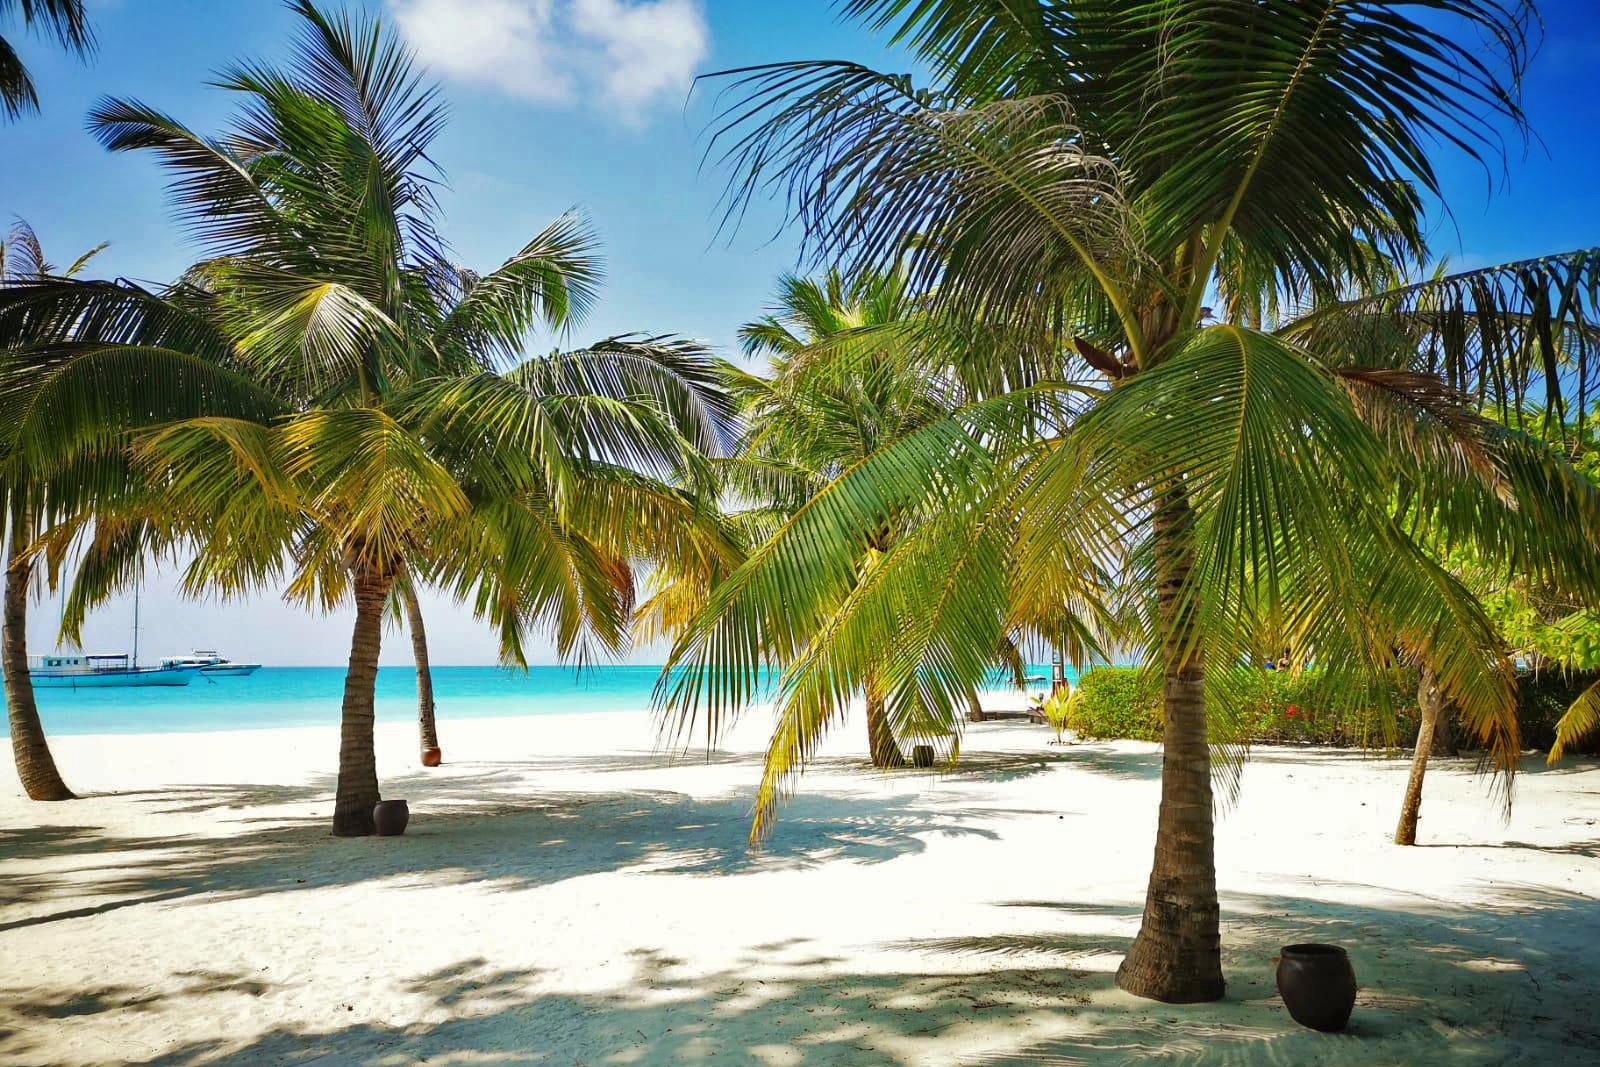 Sejur plaja Maldive, 10 zile - mai 2021